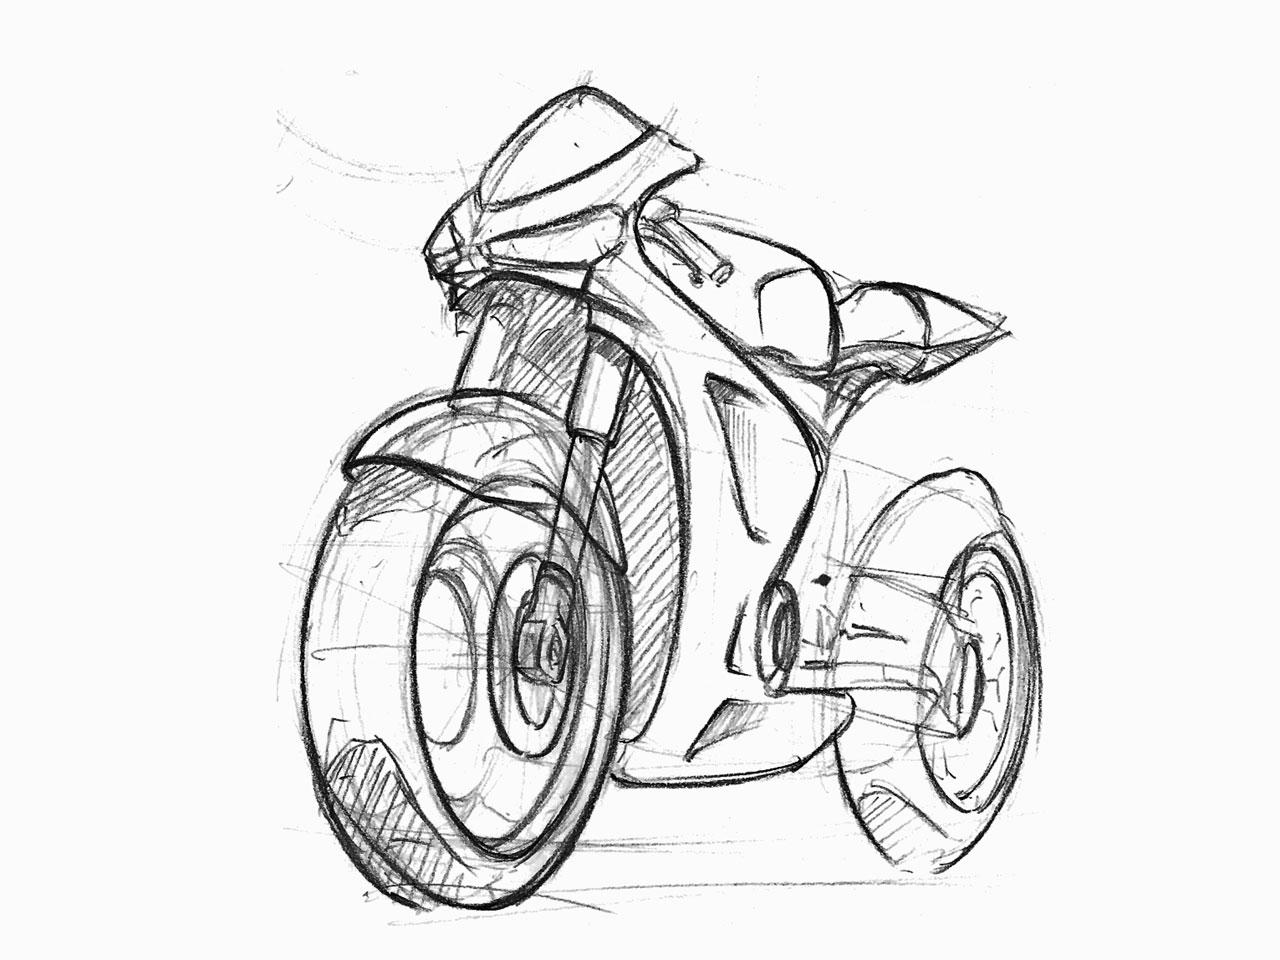 Motorcycle Sketches By Sen Heng At Coroflot